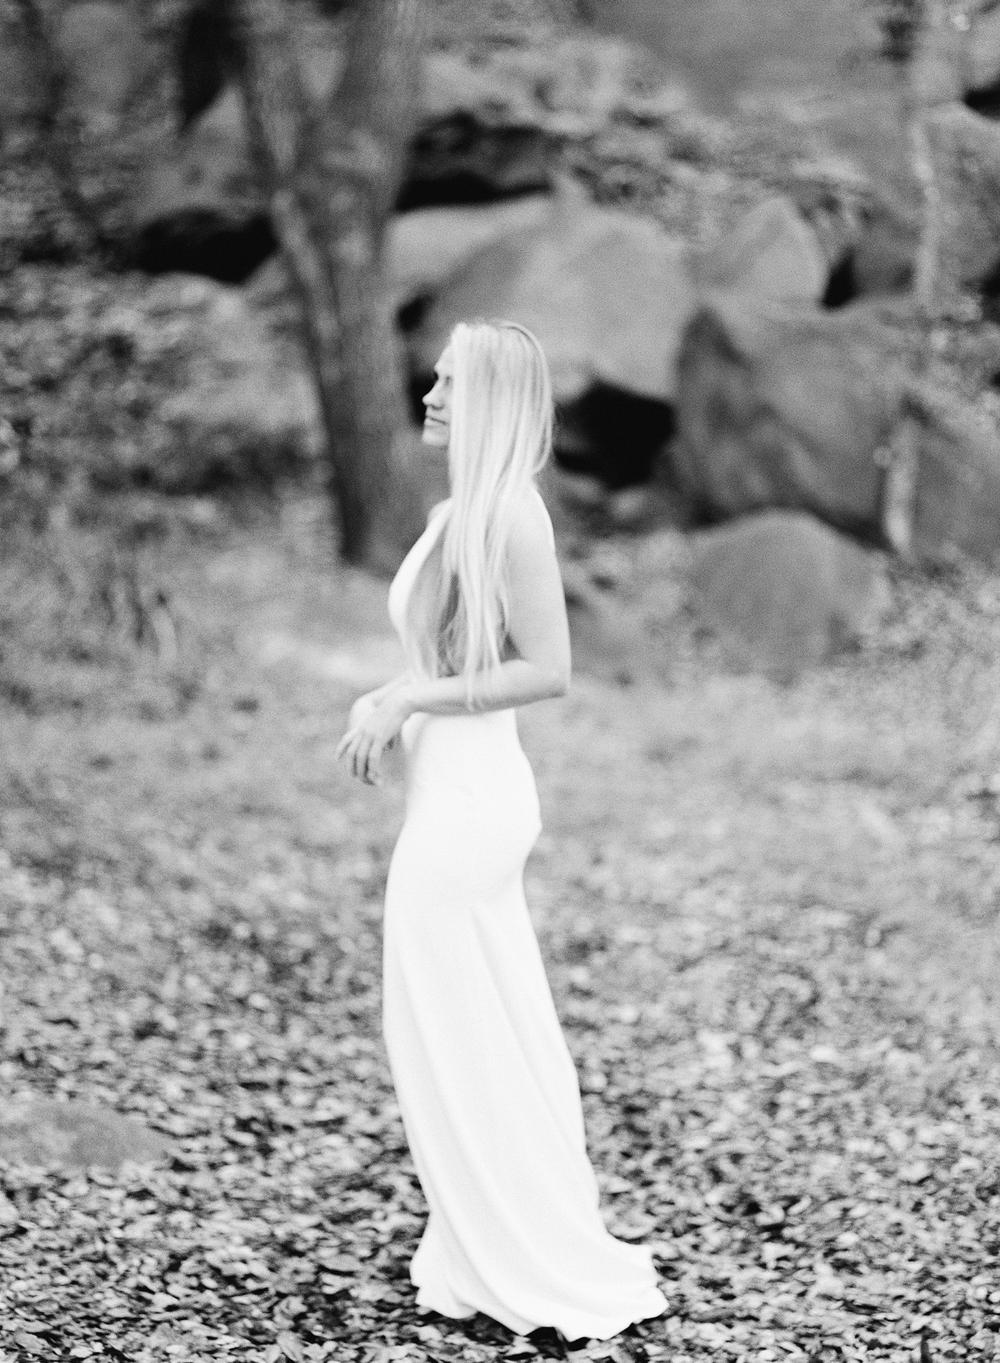 003-Jen-Wojcik-Photography-San-Diego-Photographer.jpg